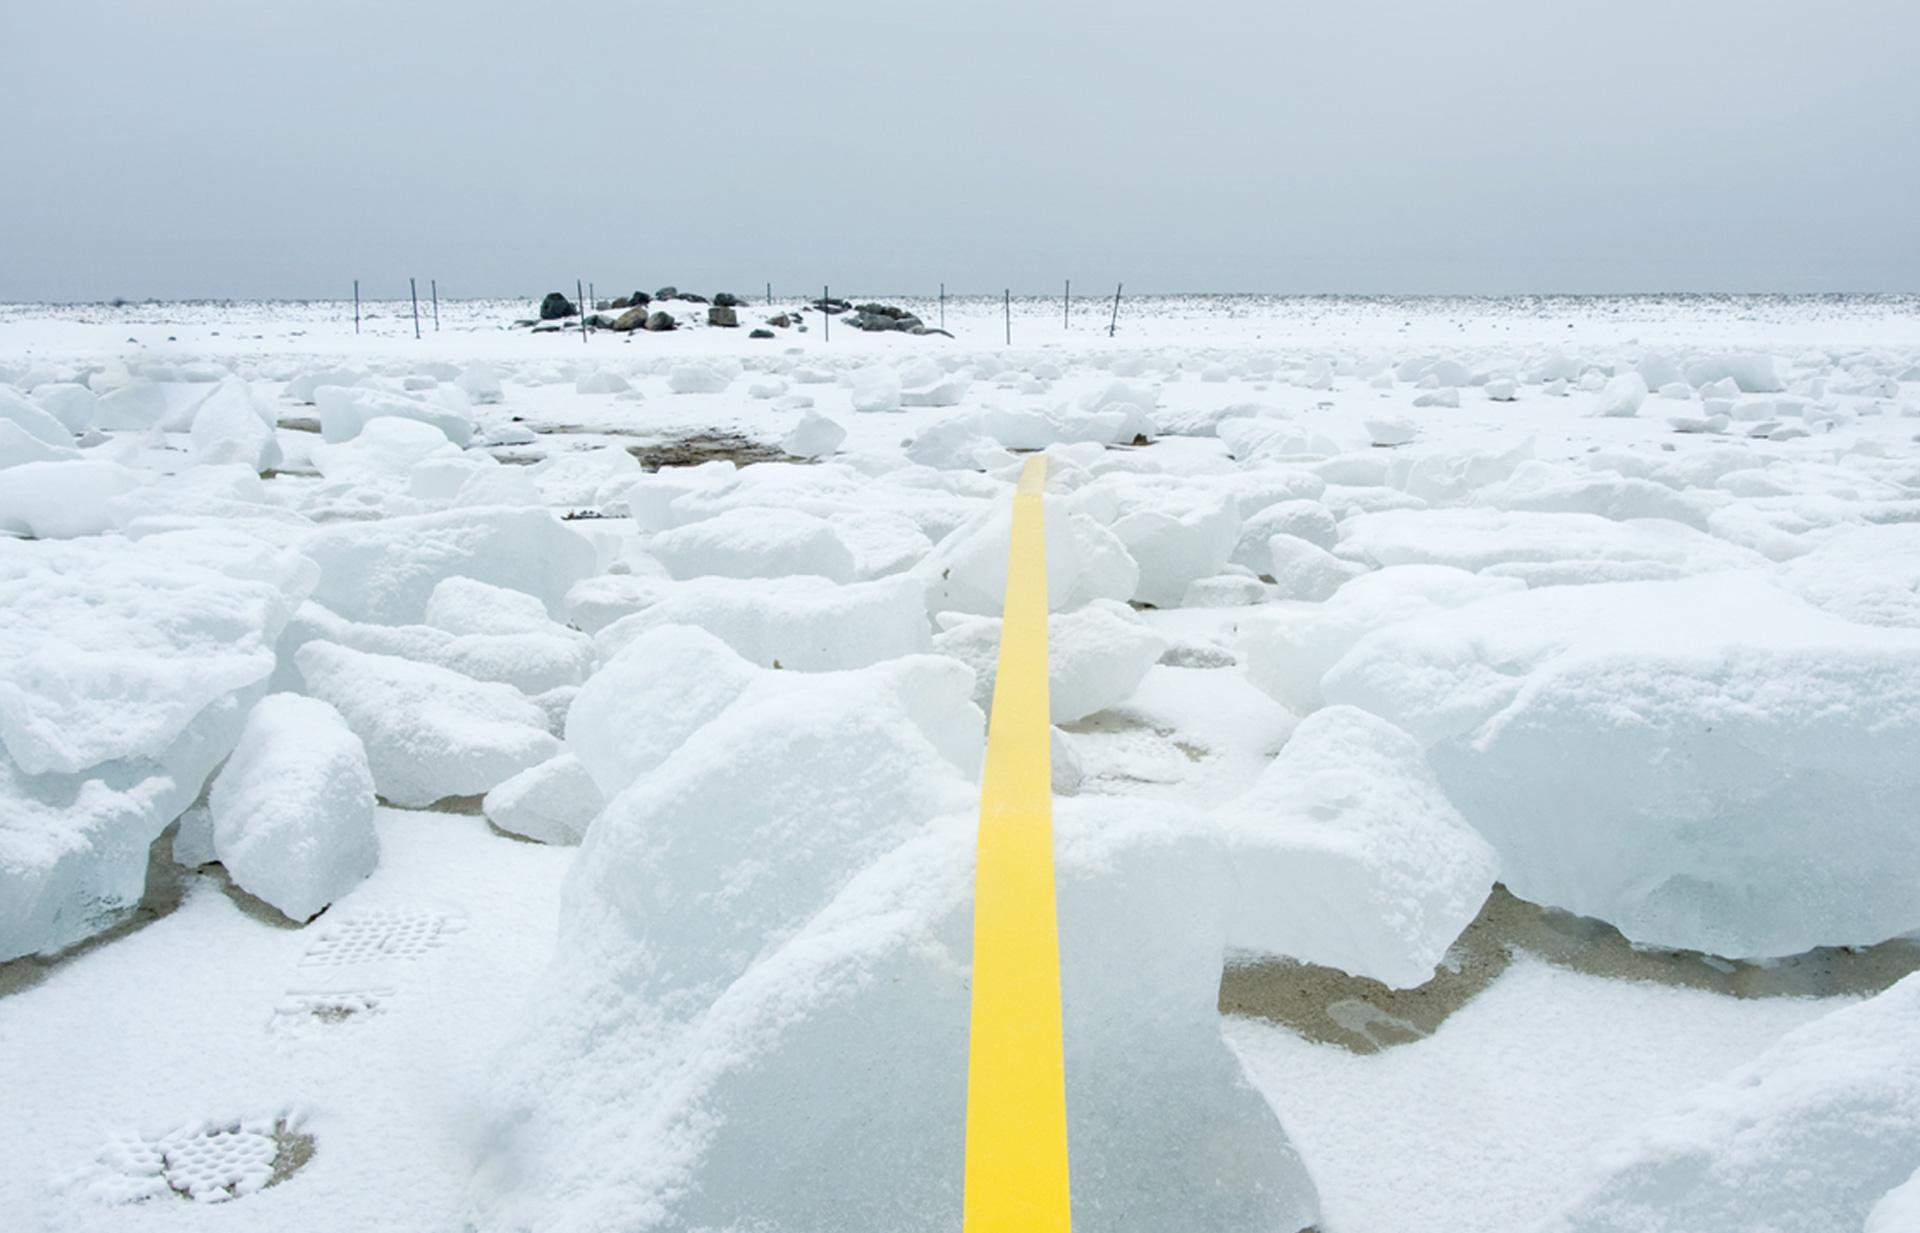 Arctic Line : A line in the arctic marcelomoscheta